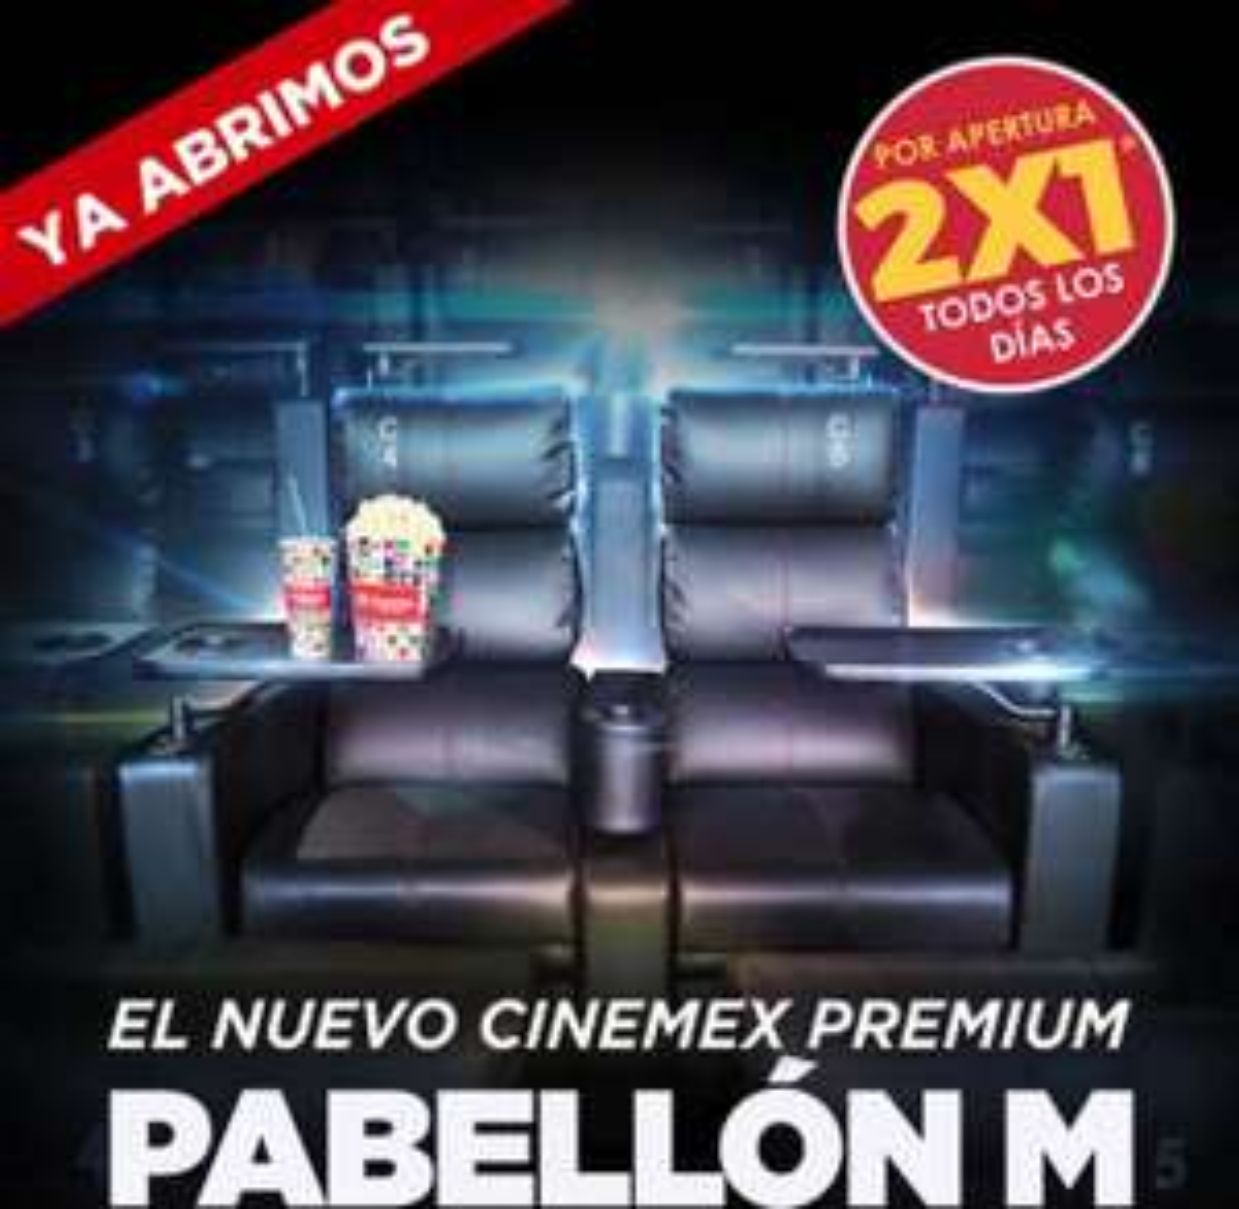 Cinemex Premium Pabellon M (Mty) 2x1